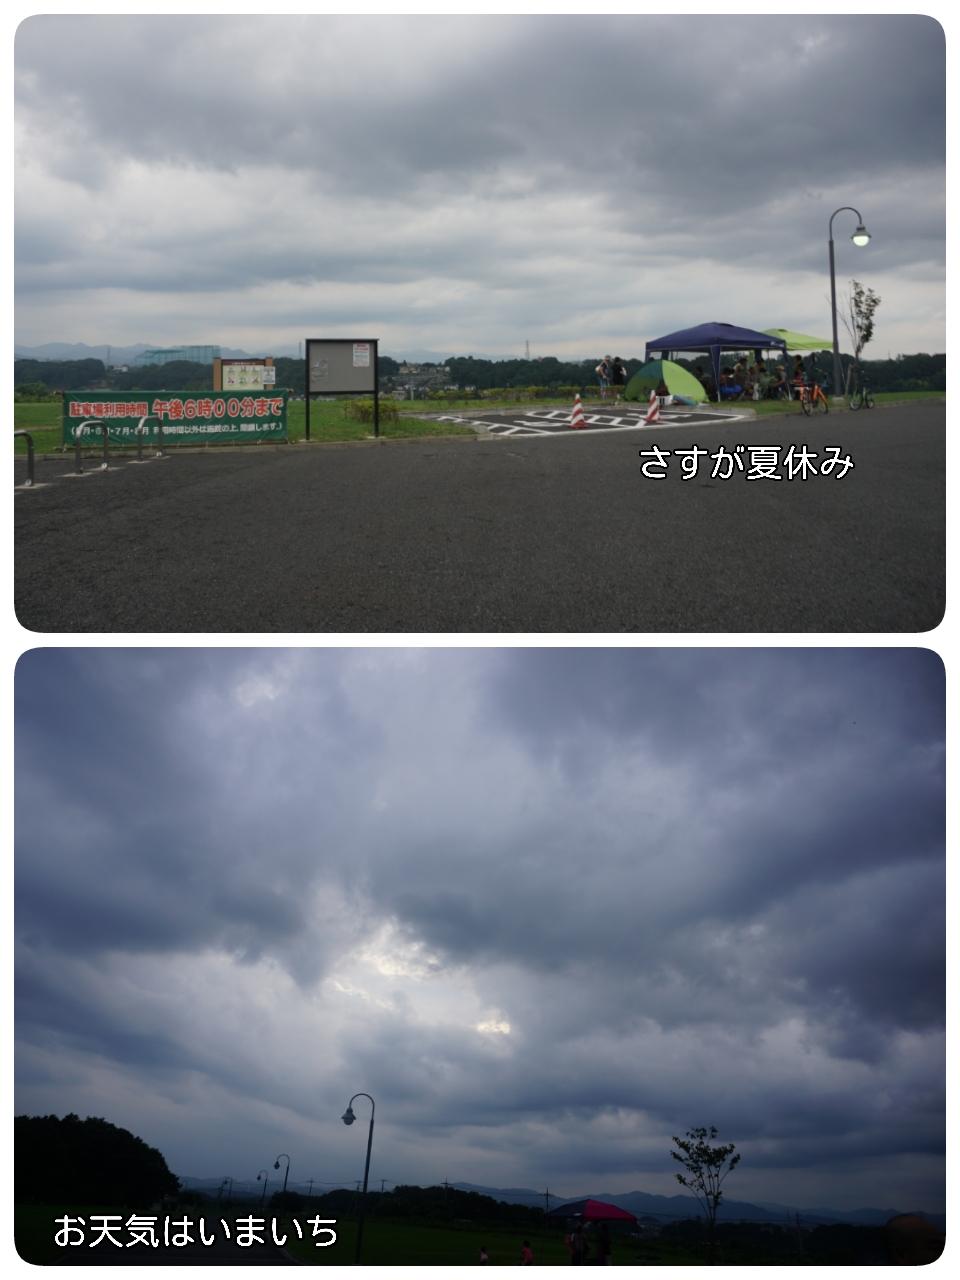 2015-08-16-21-40-21_deco.jpg